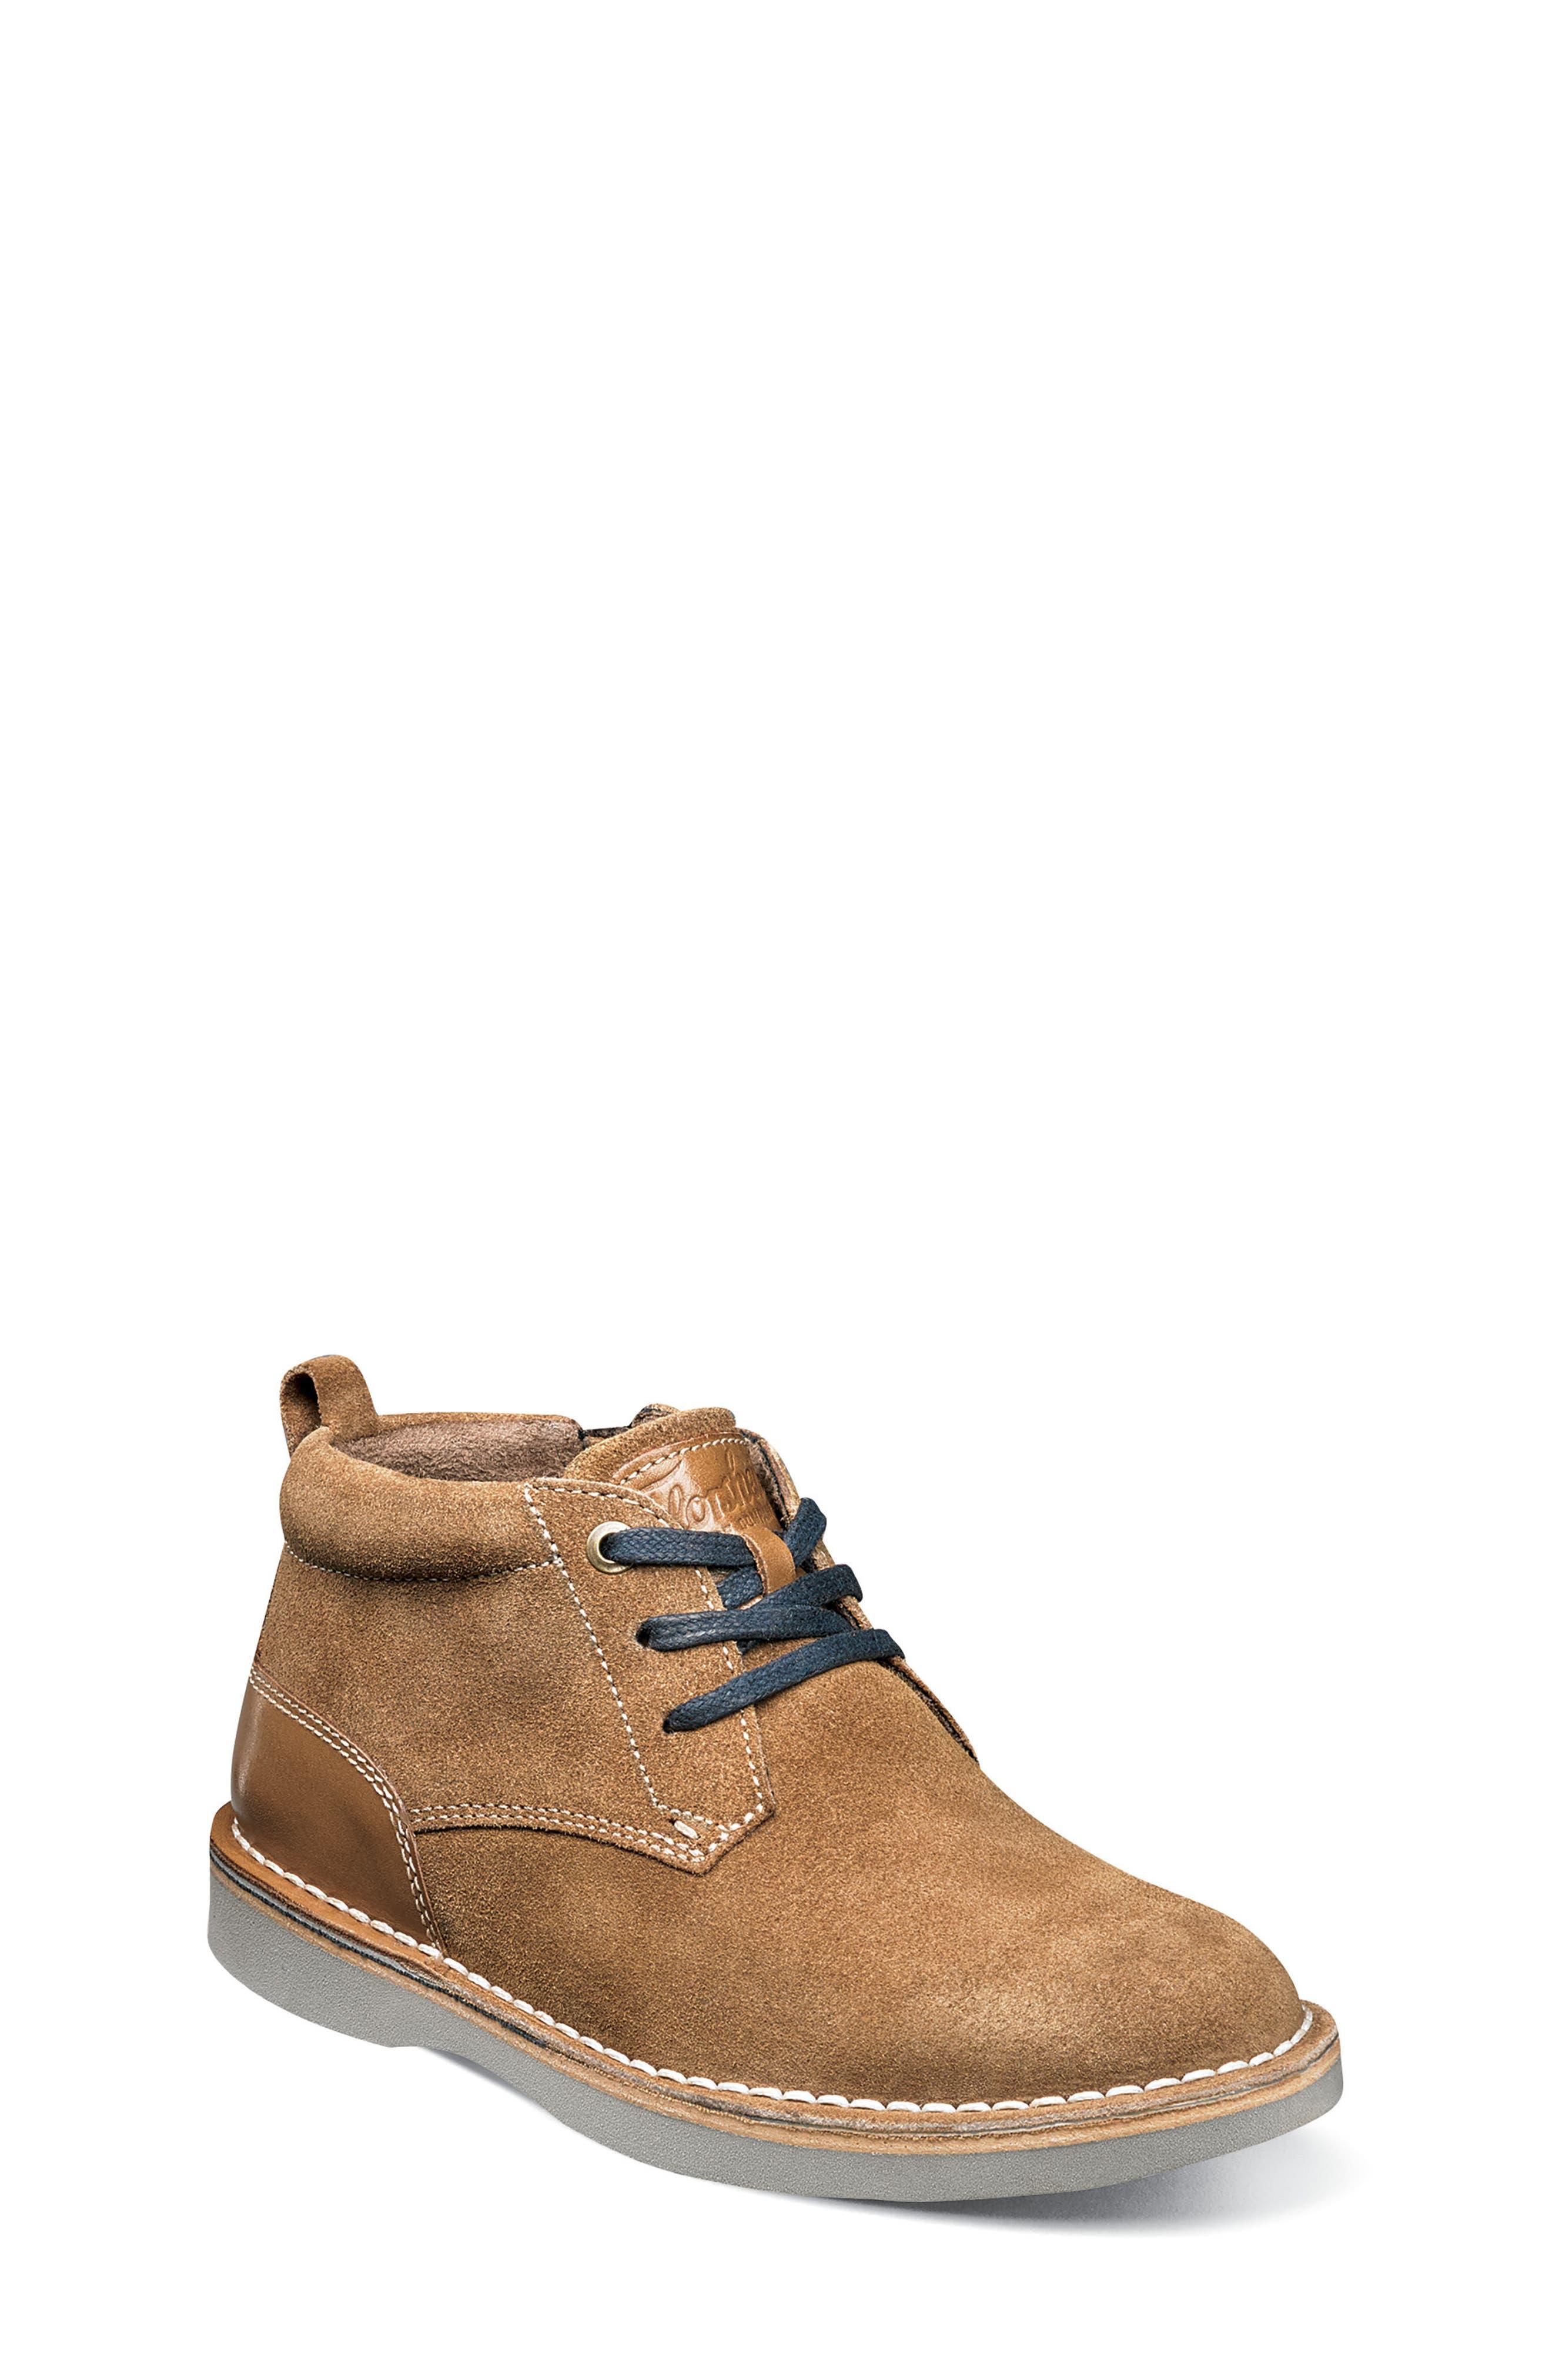 Chukka Boot,                         Main,                         color, MOCHA SUEDE